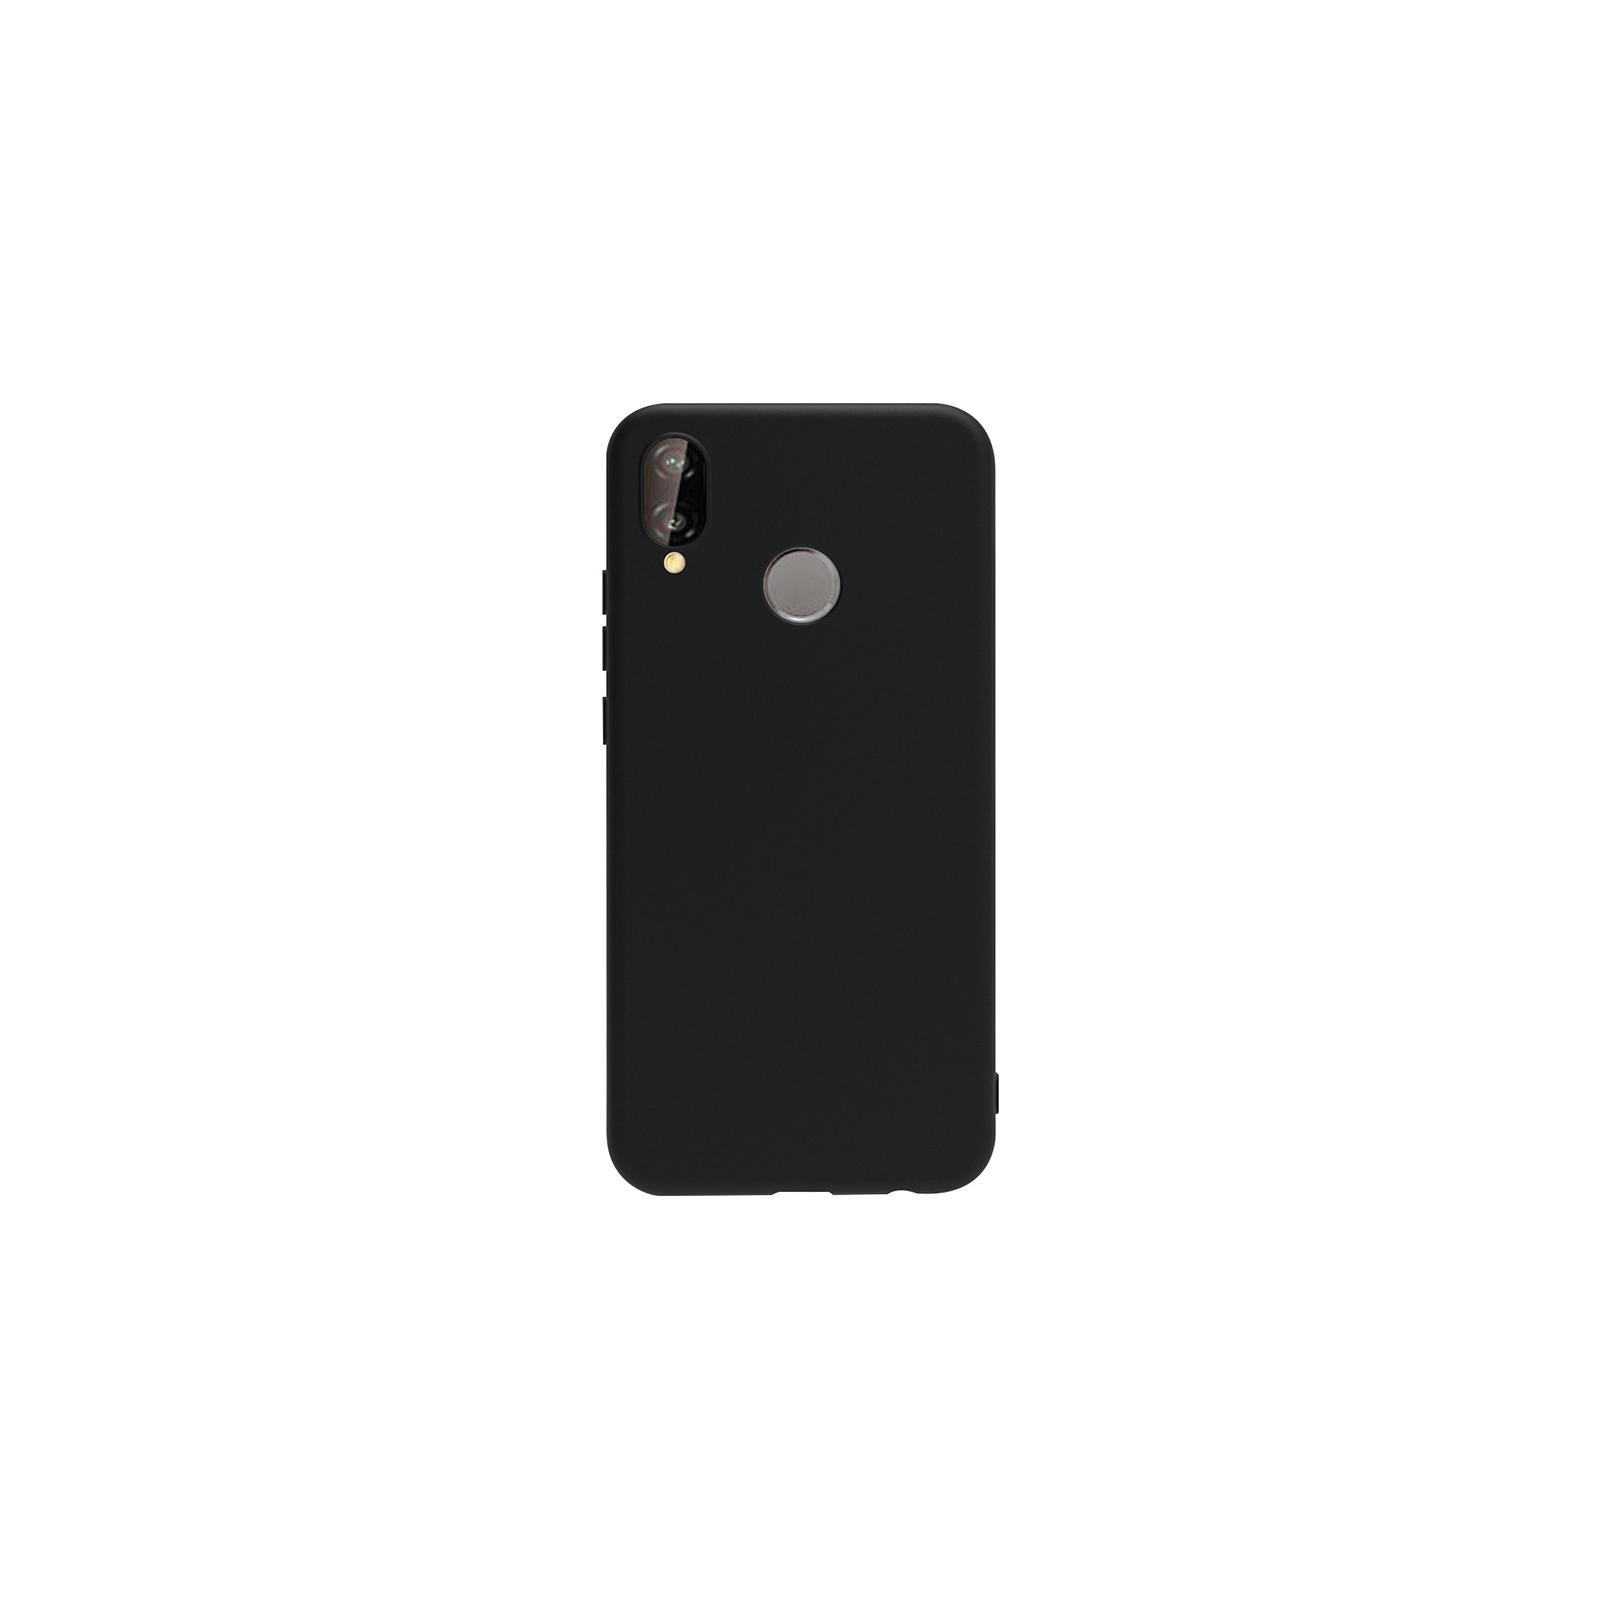 Чехол для моб. телефона Toto 1mm Matt TPU Case Huawei P20 lite Black (F_99808)